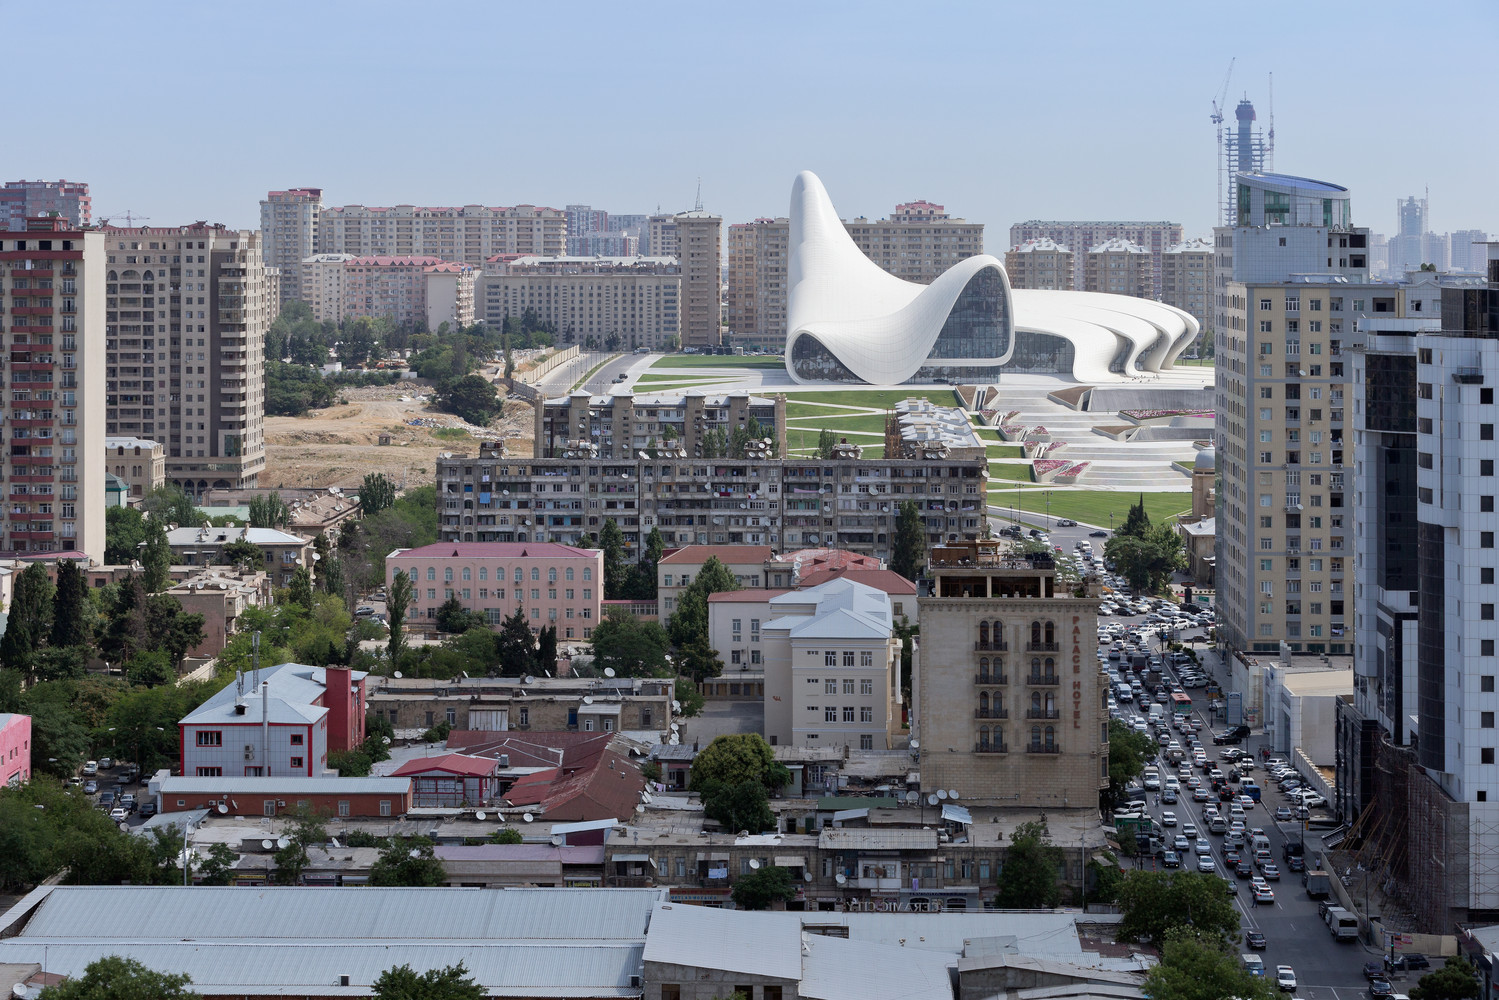 Heydar Aliyev Center-Zaha Hadid Architects-IGS Nostalgia-Architectural Photography-18